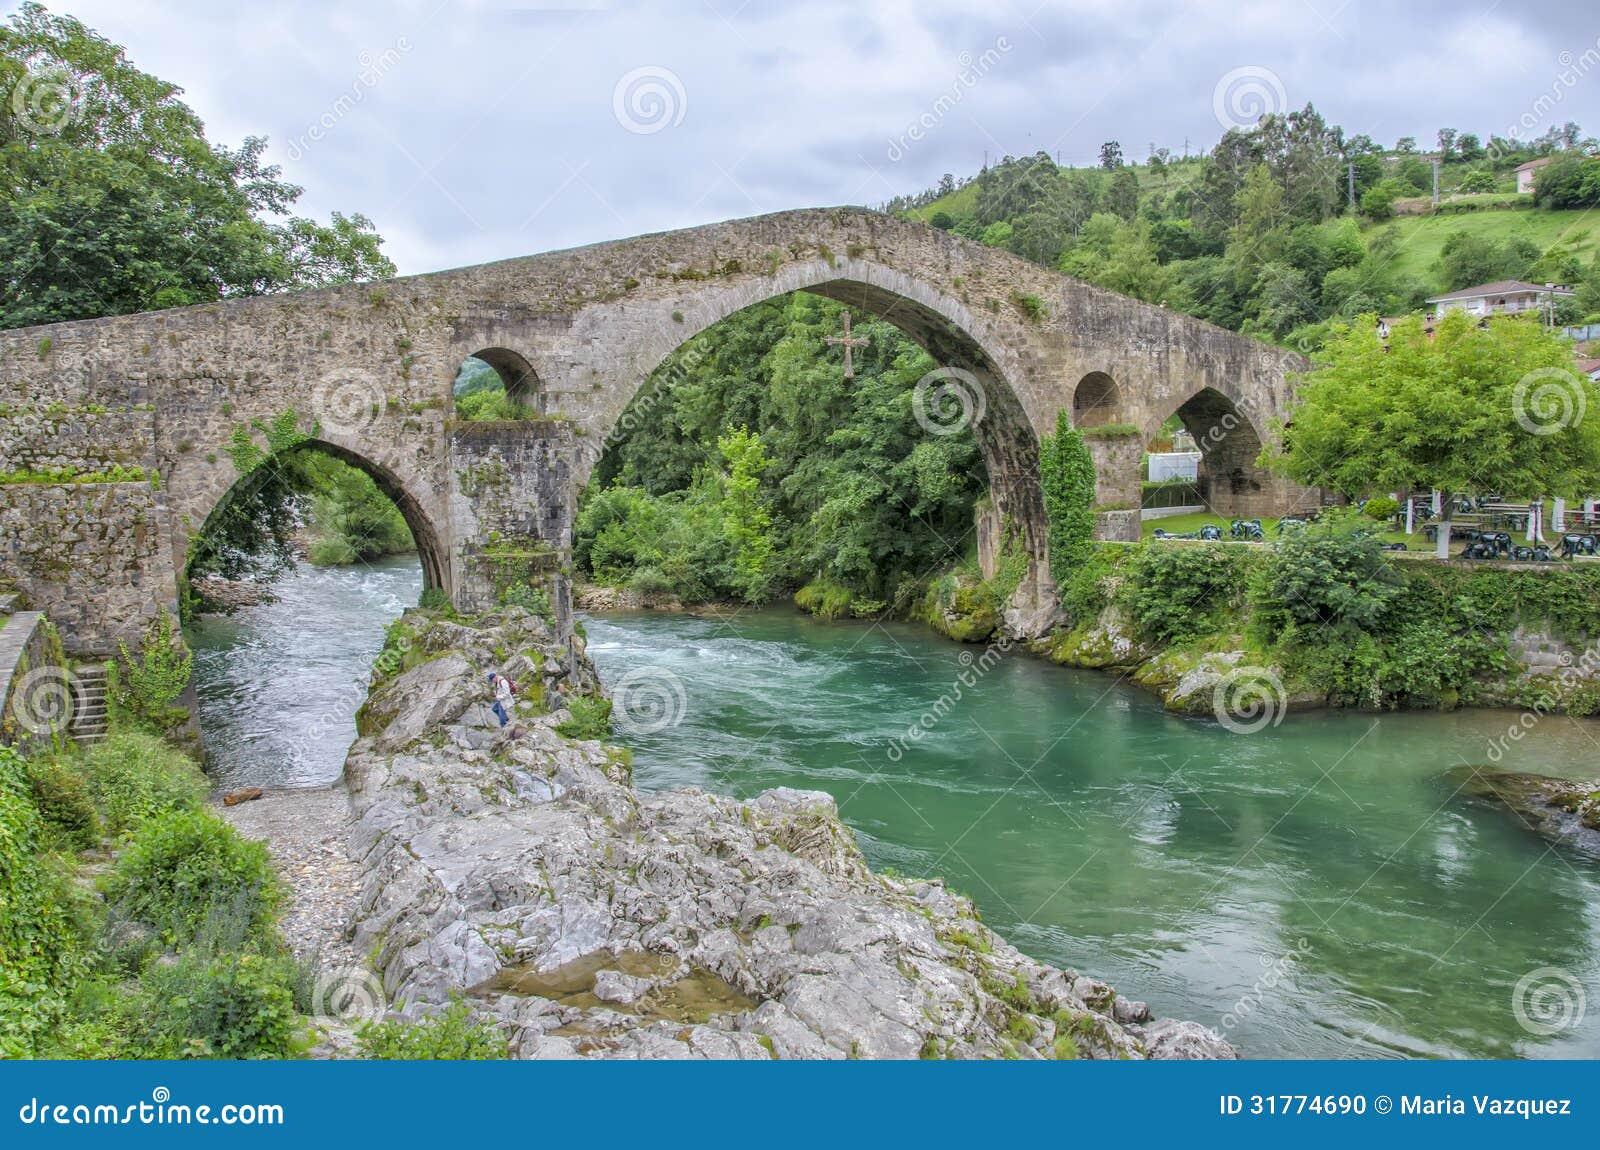 Cangas Spain  city images : Bridge in Cangas de Onis, Spain.